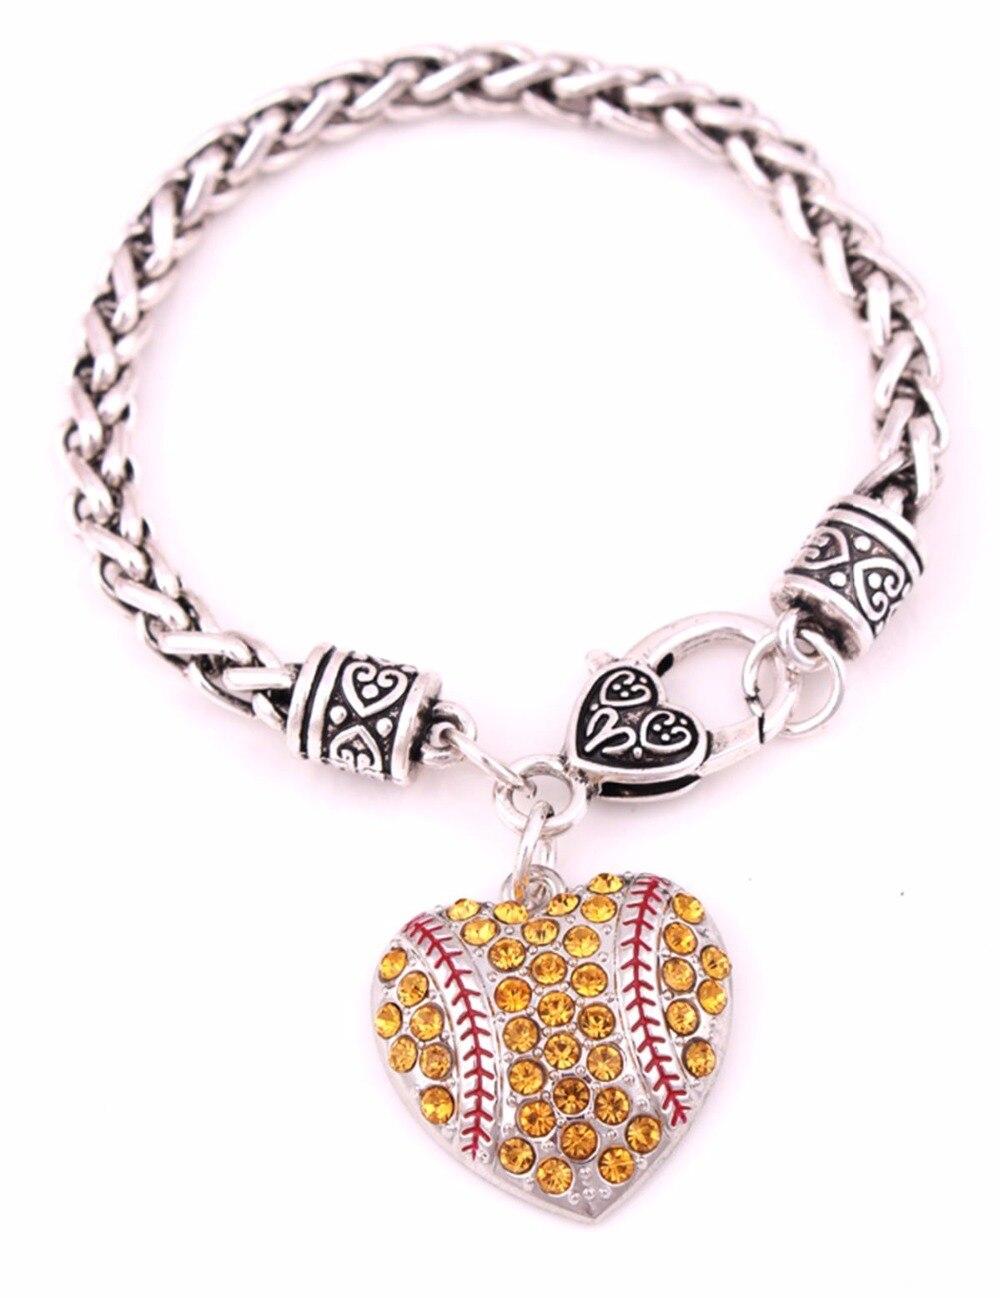 Antique Sliver Plated Zinc Studded With Sparkling Crystal Softball Heart  Pendant Charm Bracelet